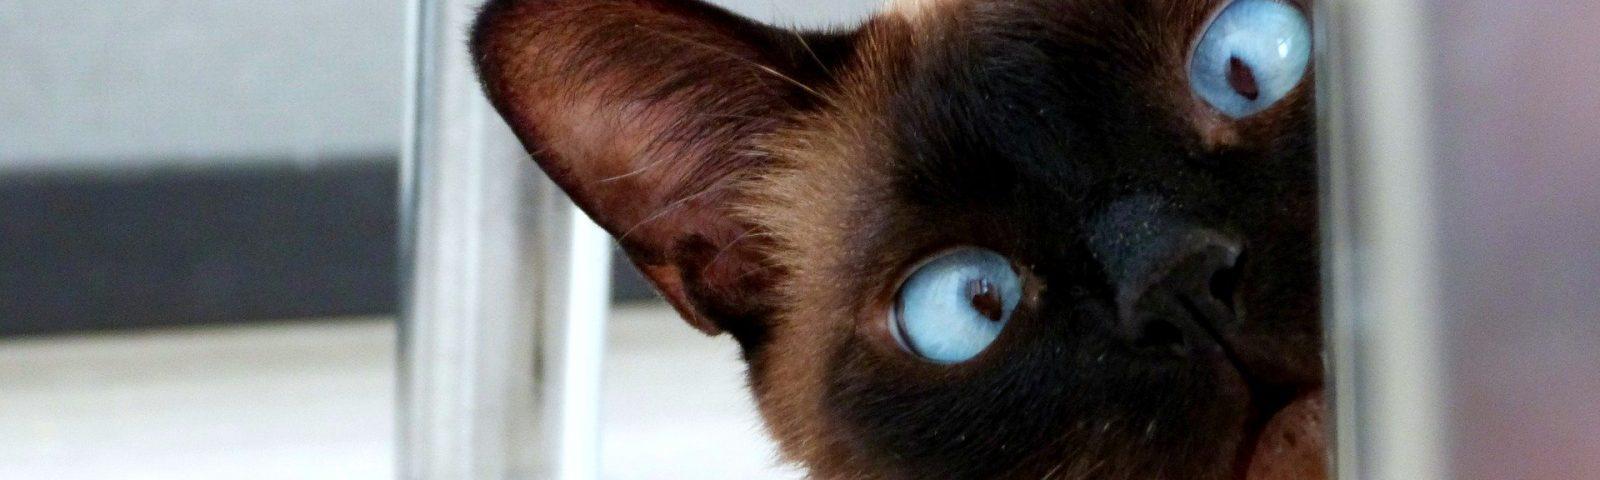 eyes 3924800 1920